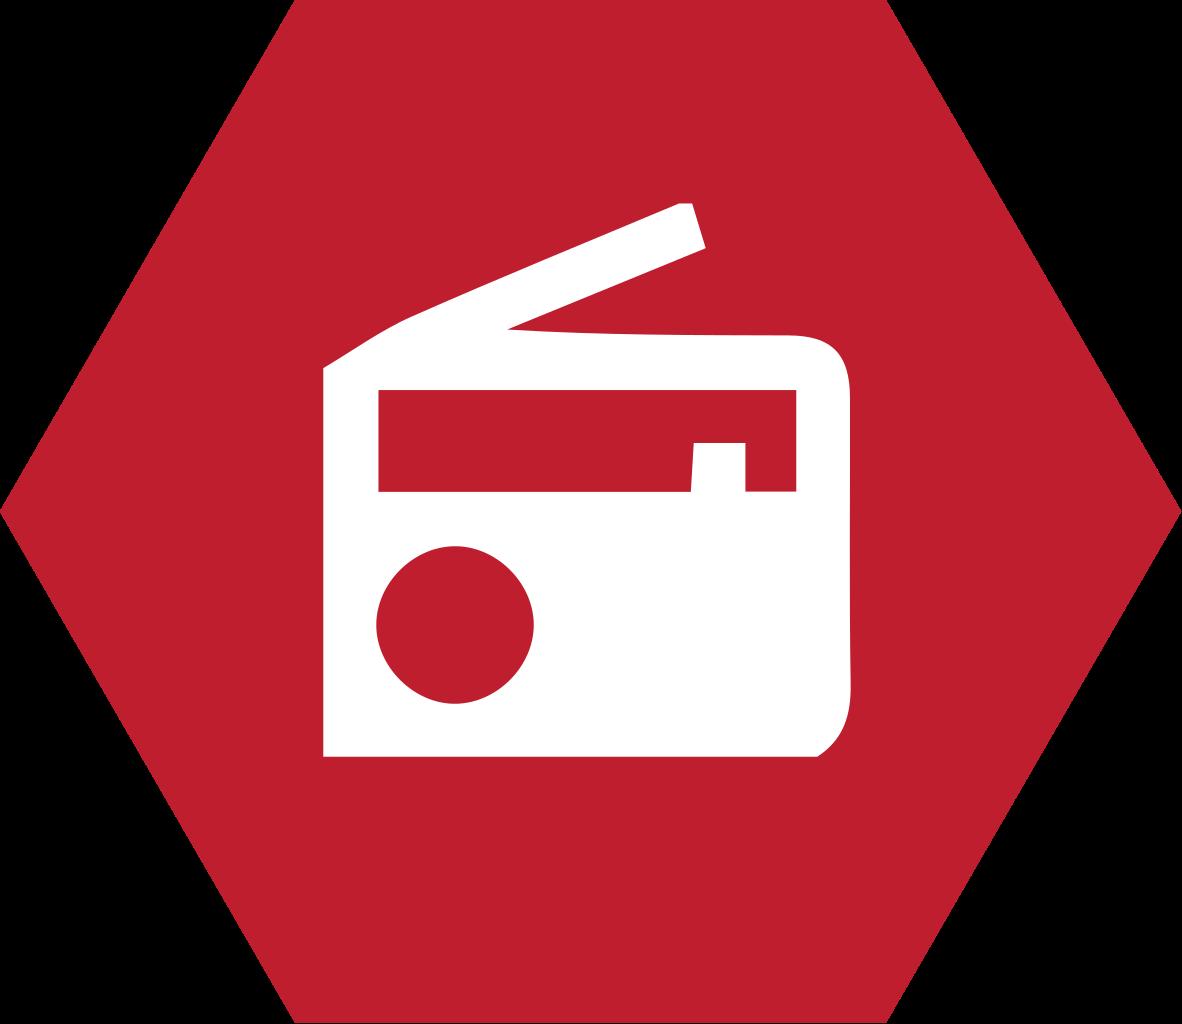 File radio icon svg. Hexagon clipart pixel art